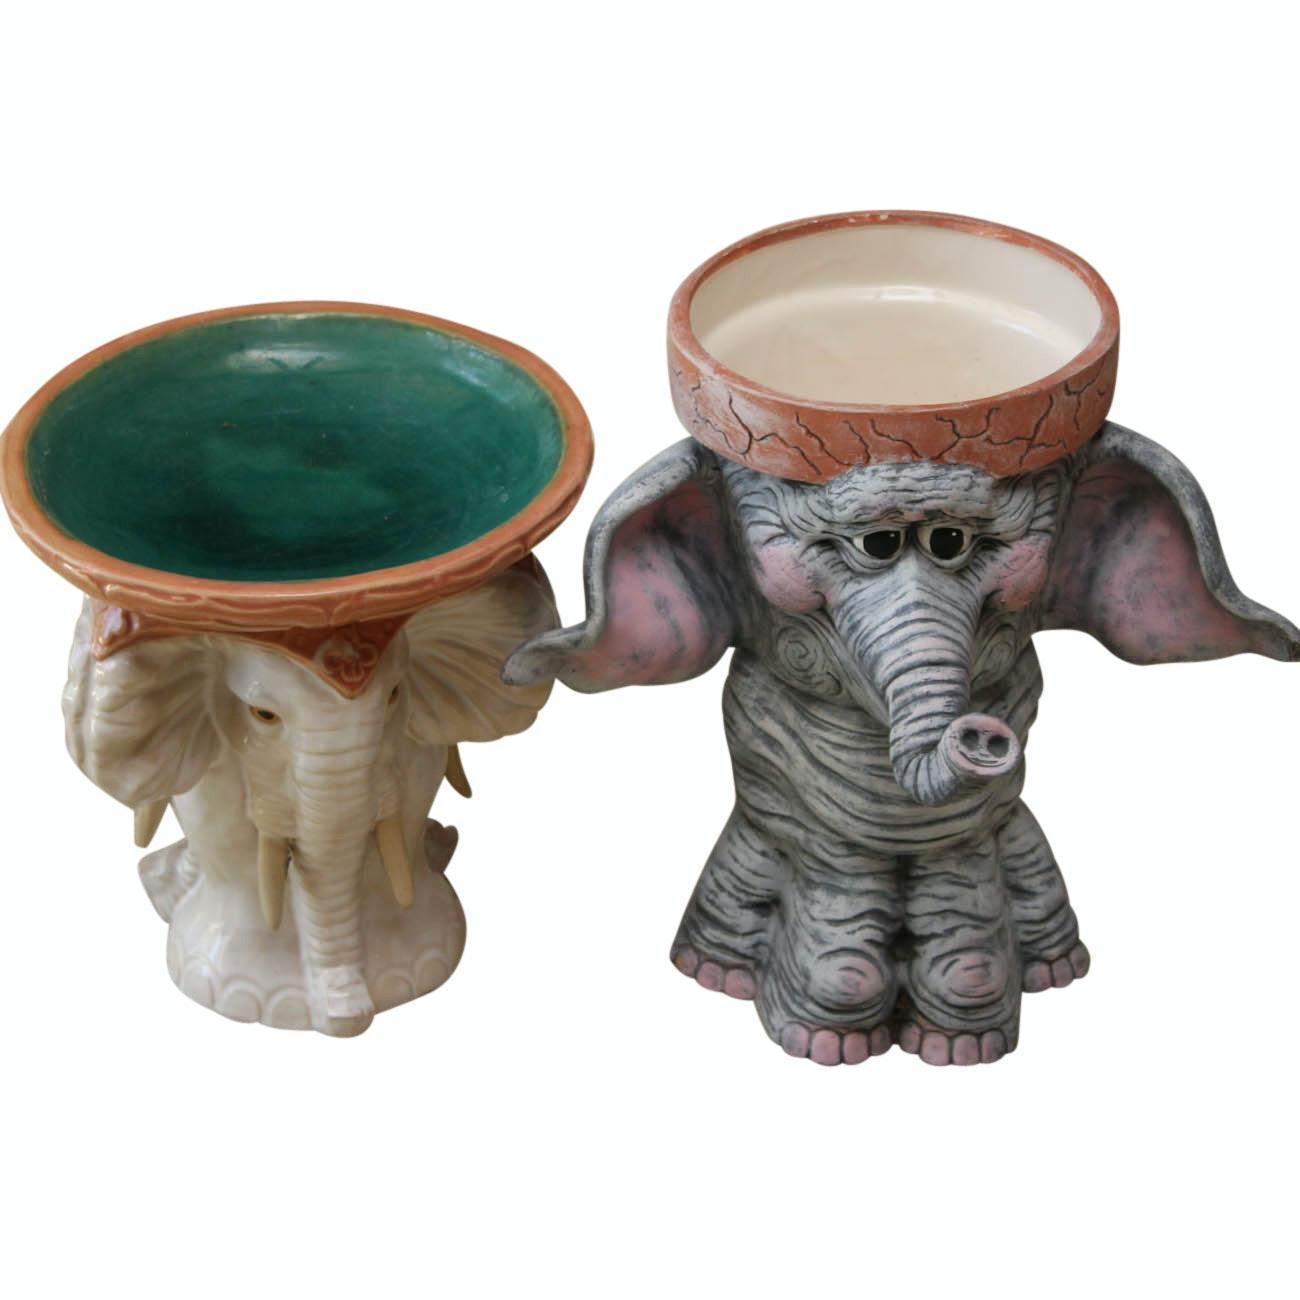 Figural Elephant Planters